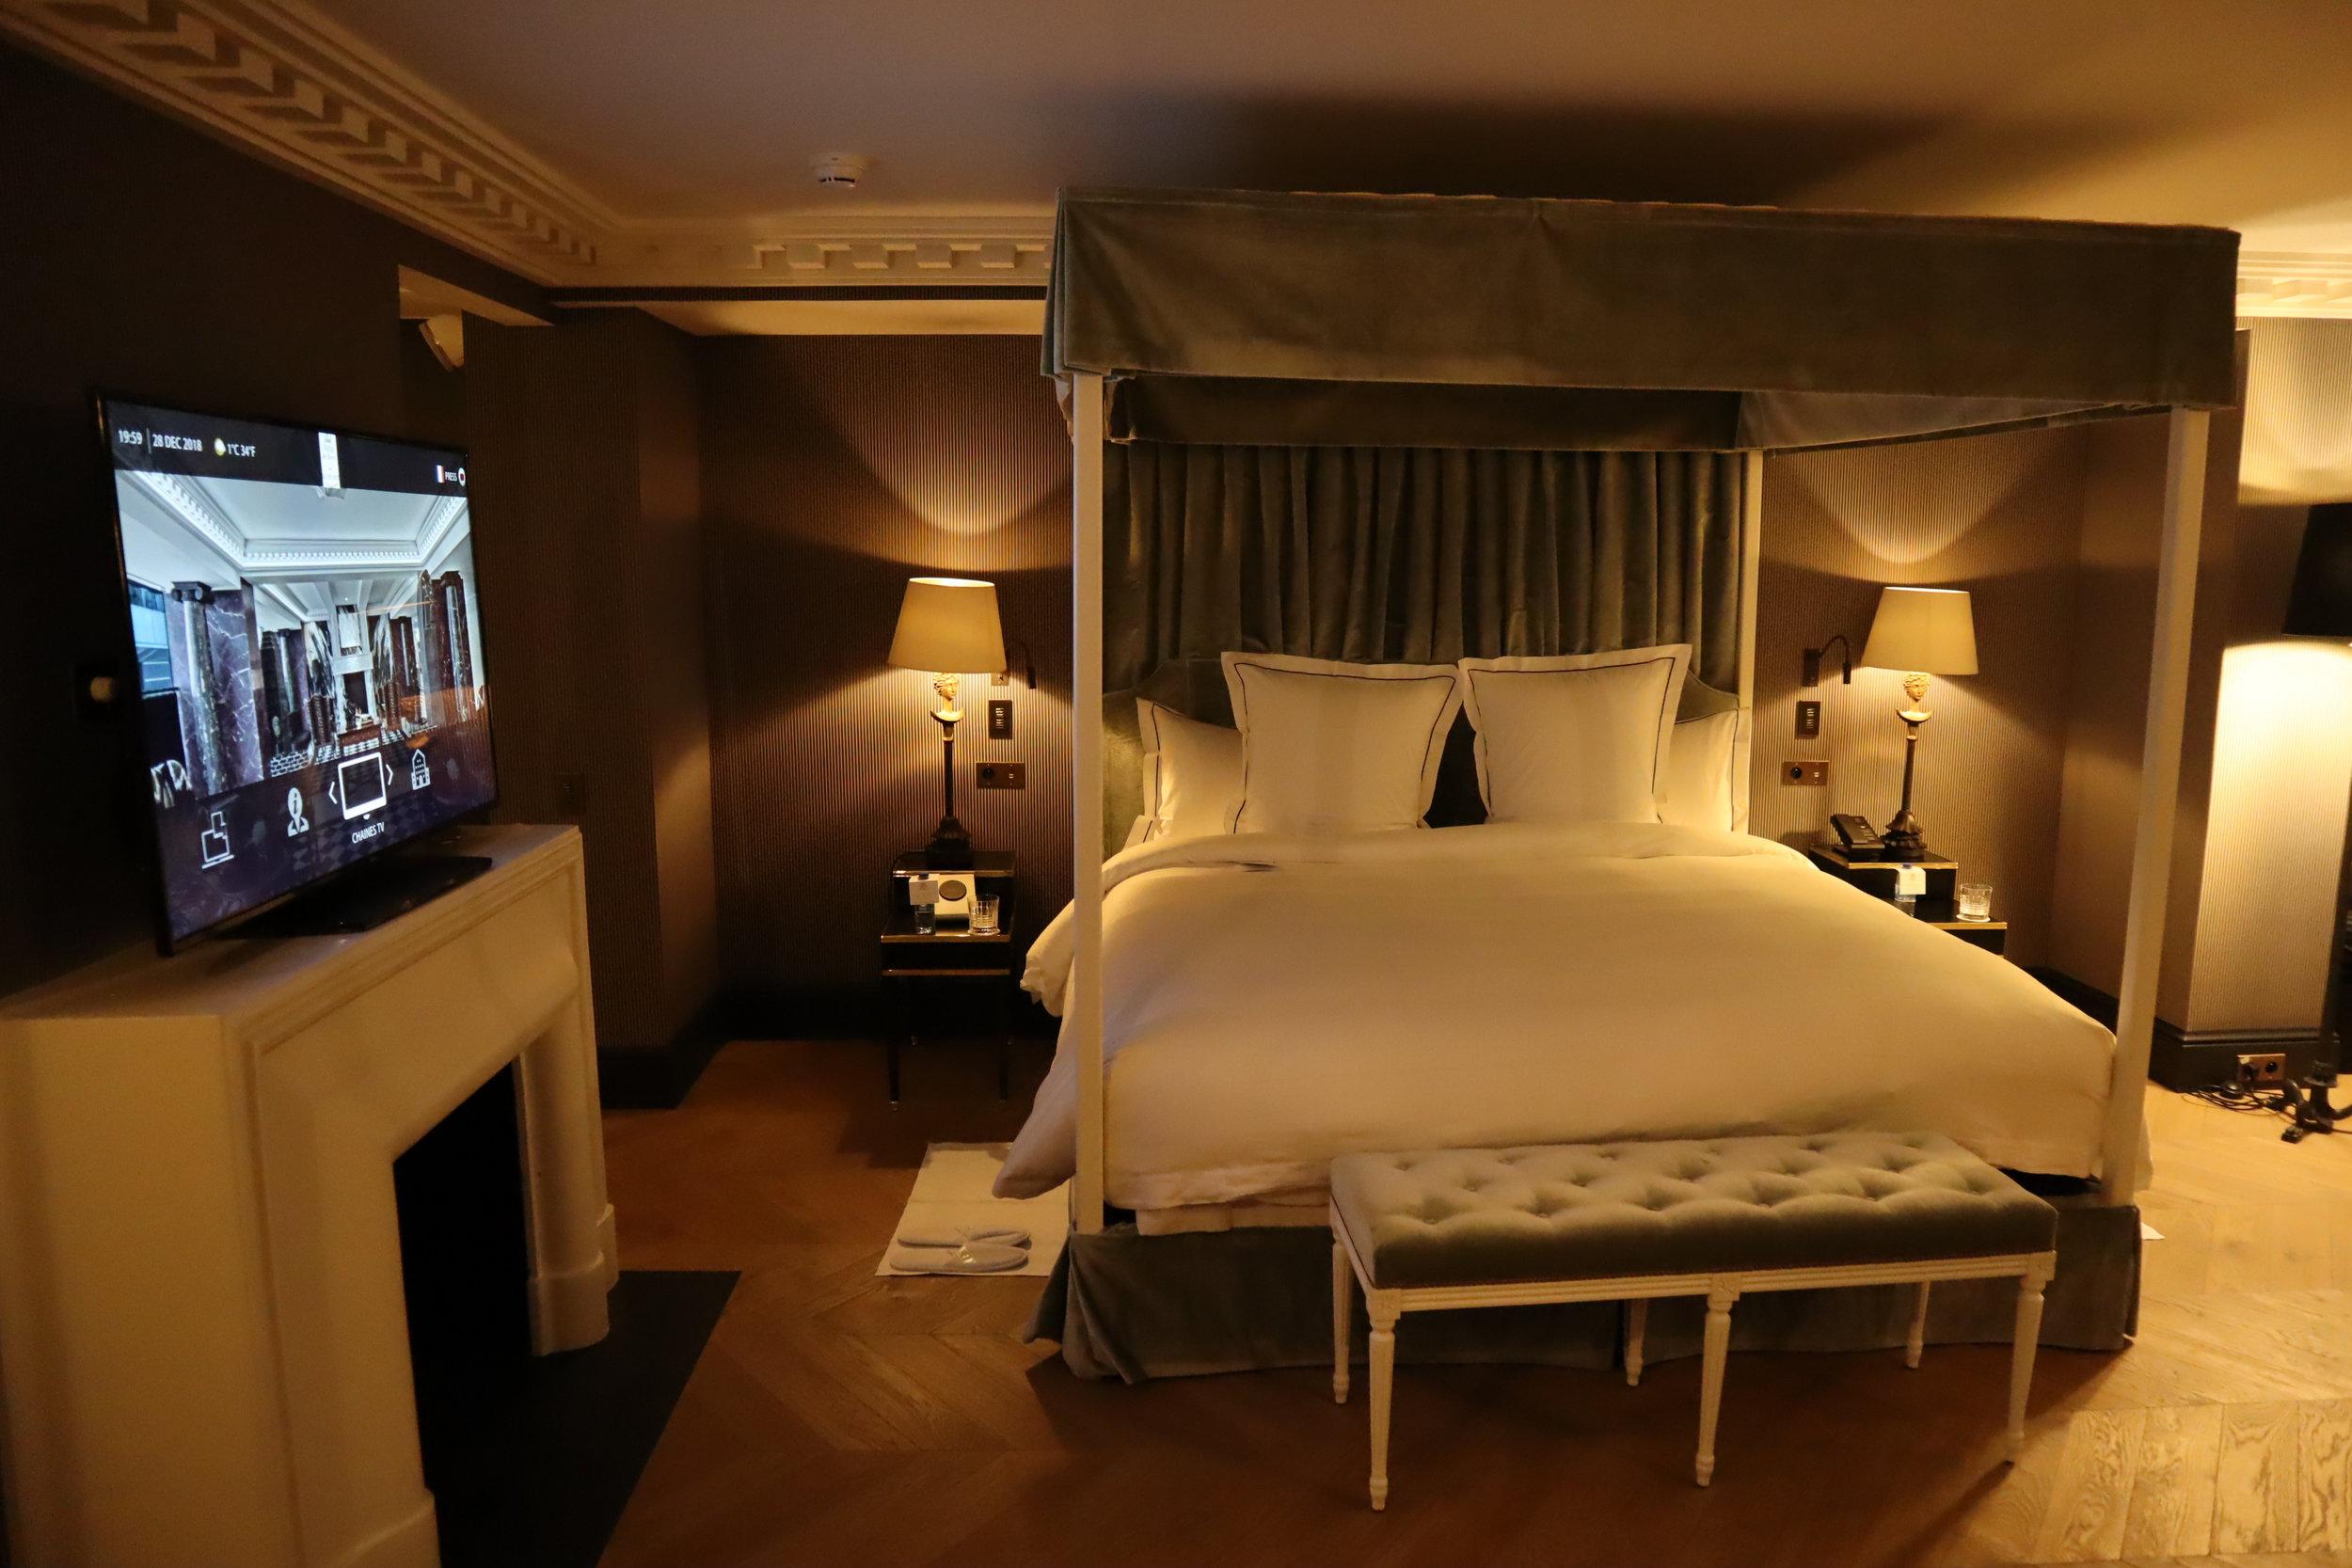 Hôtel de Berri Paris – Berri Suite king bed